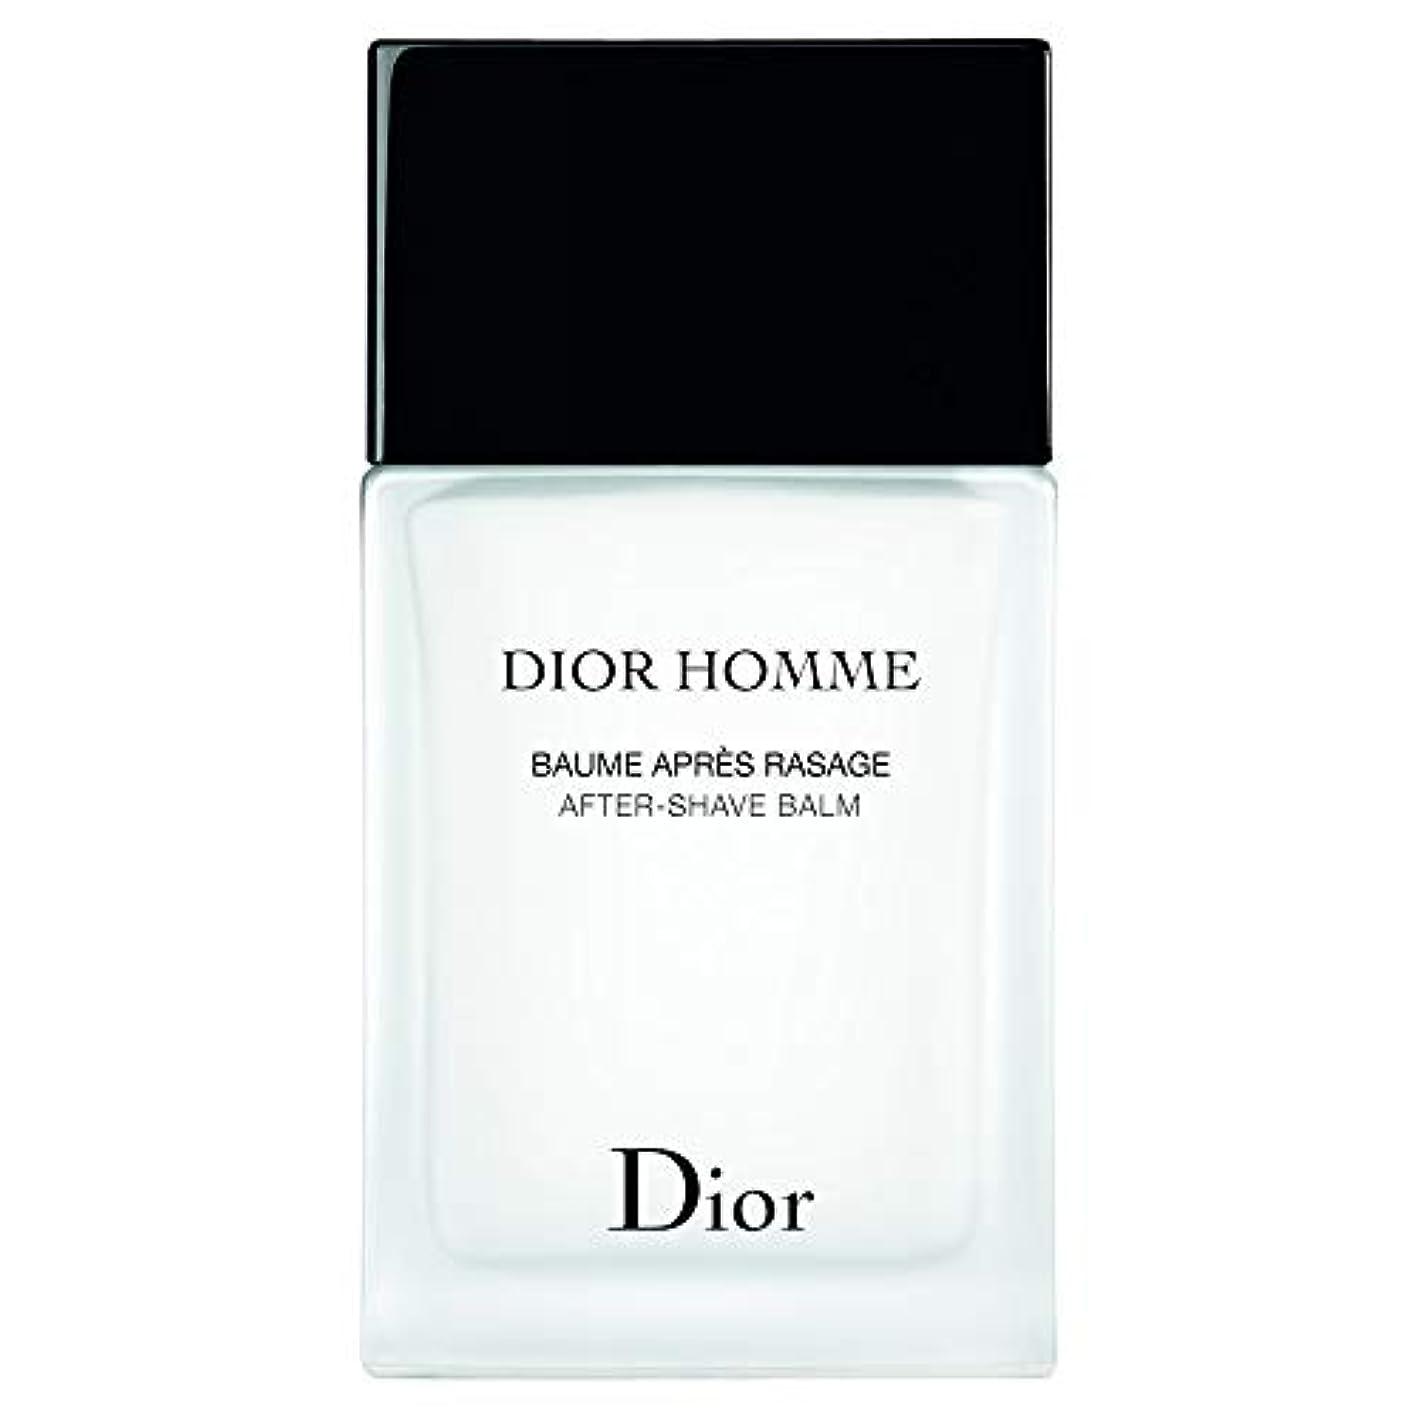 [Dior] ディオールオムアフターシェーブバーム100ミリリットル - Dior Homme After-Shave Balm 100ml [並行輸入品]